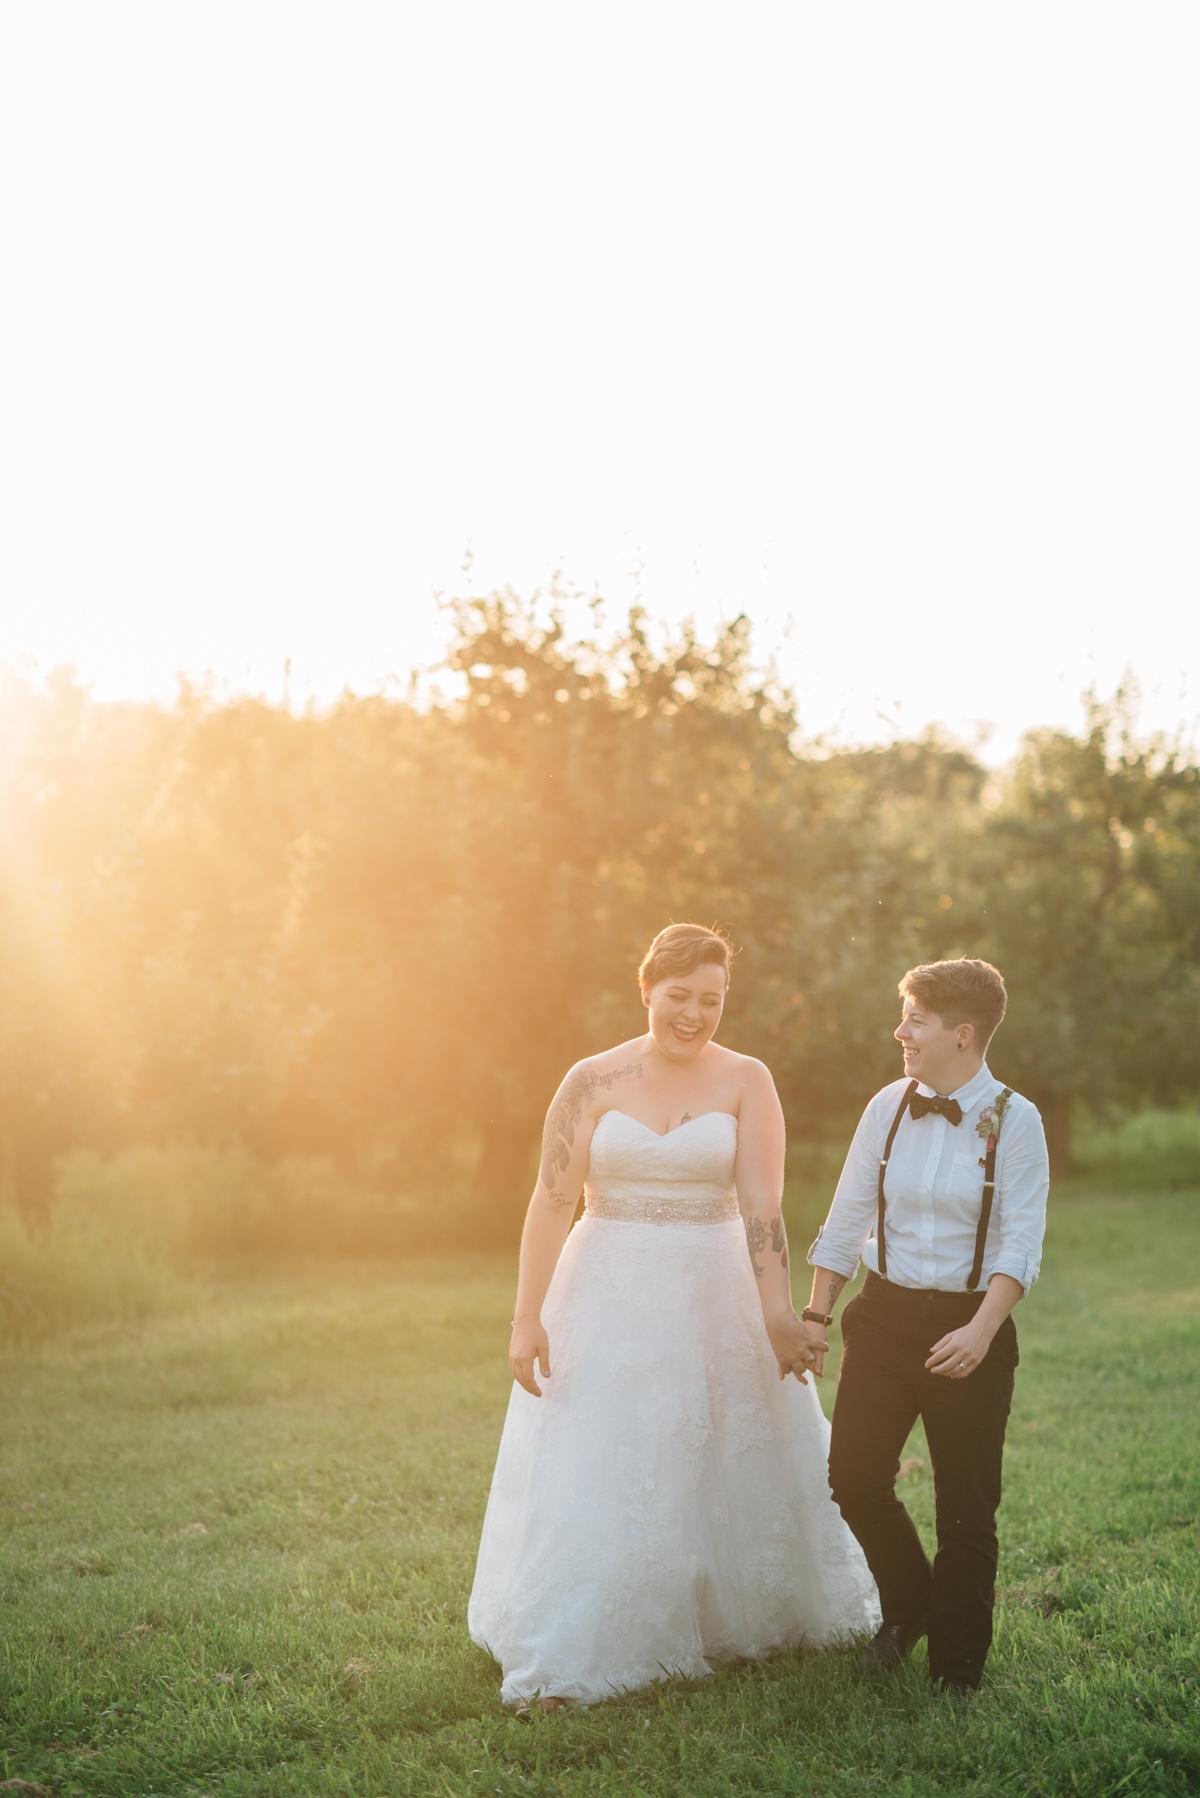 sara-wilde-photography-vineyard-bride-swish-list-beamer-falls-manor-grimsby-wedding-62.jpg